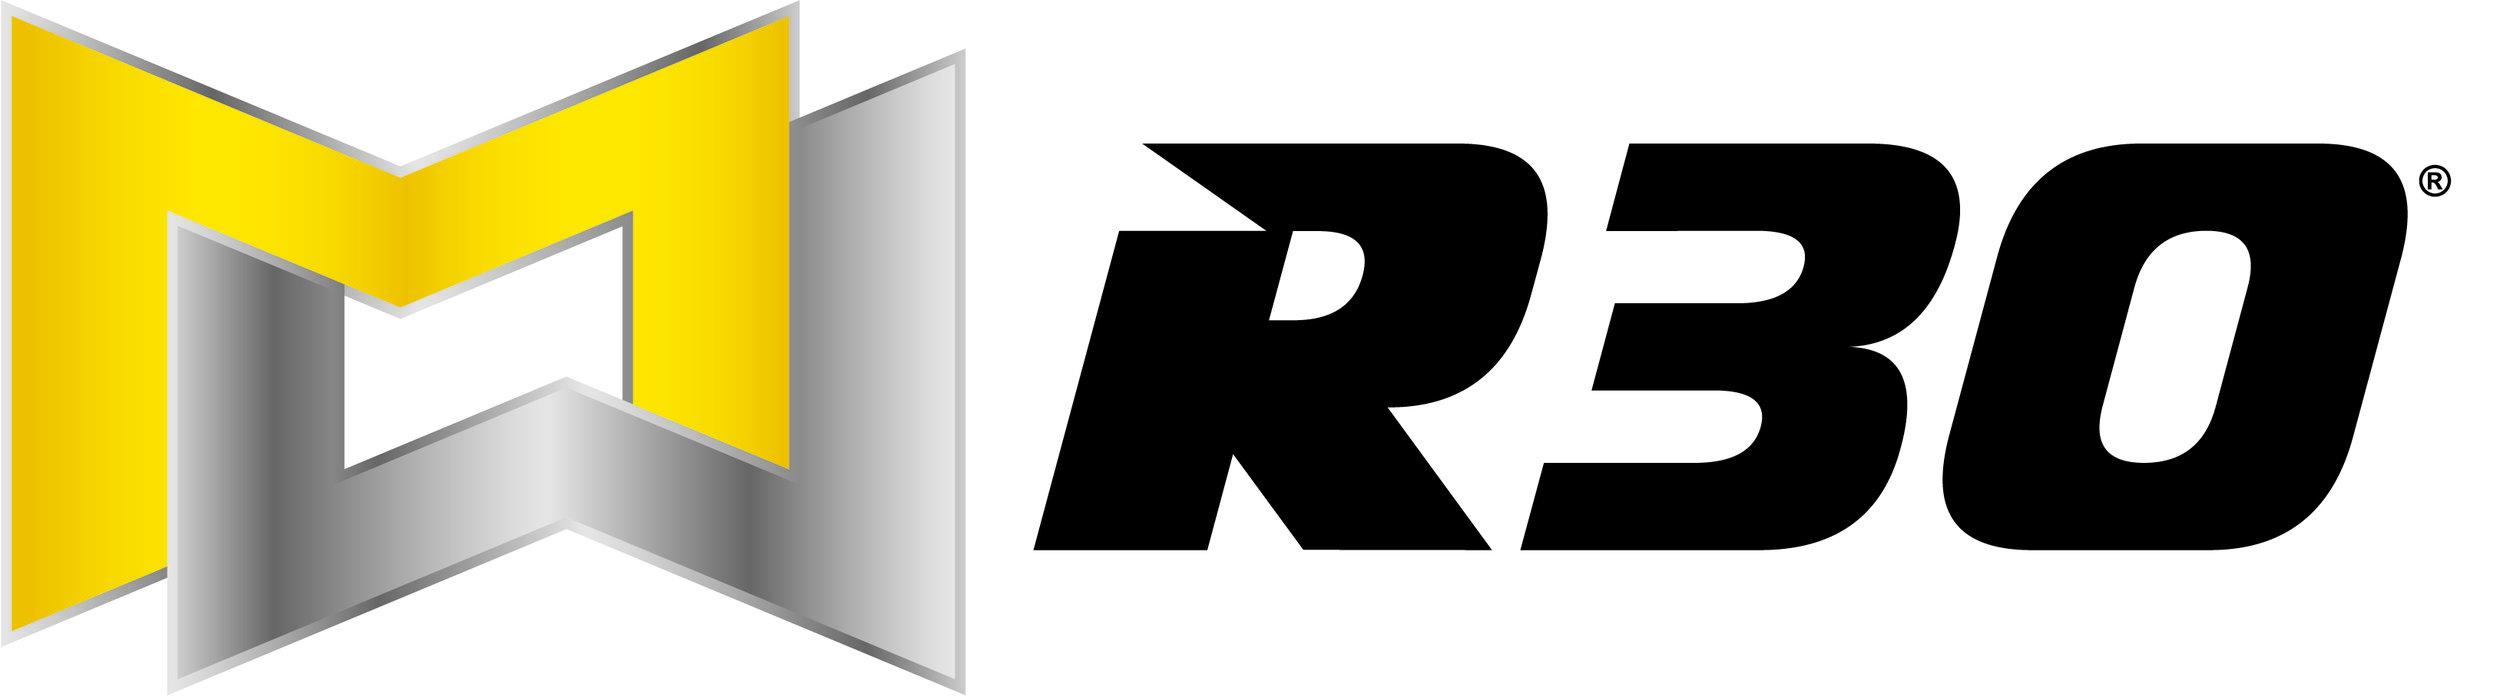 R30-MOSSA-FullLogo-CMYK-hires.jpg